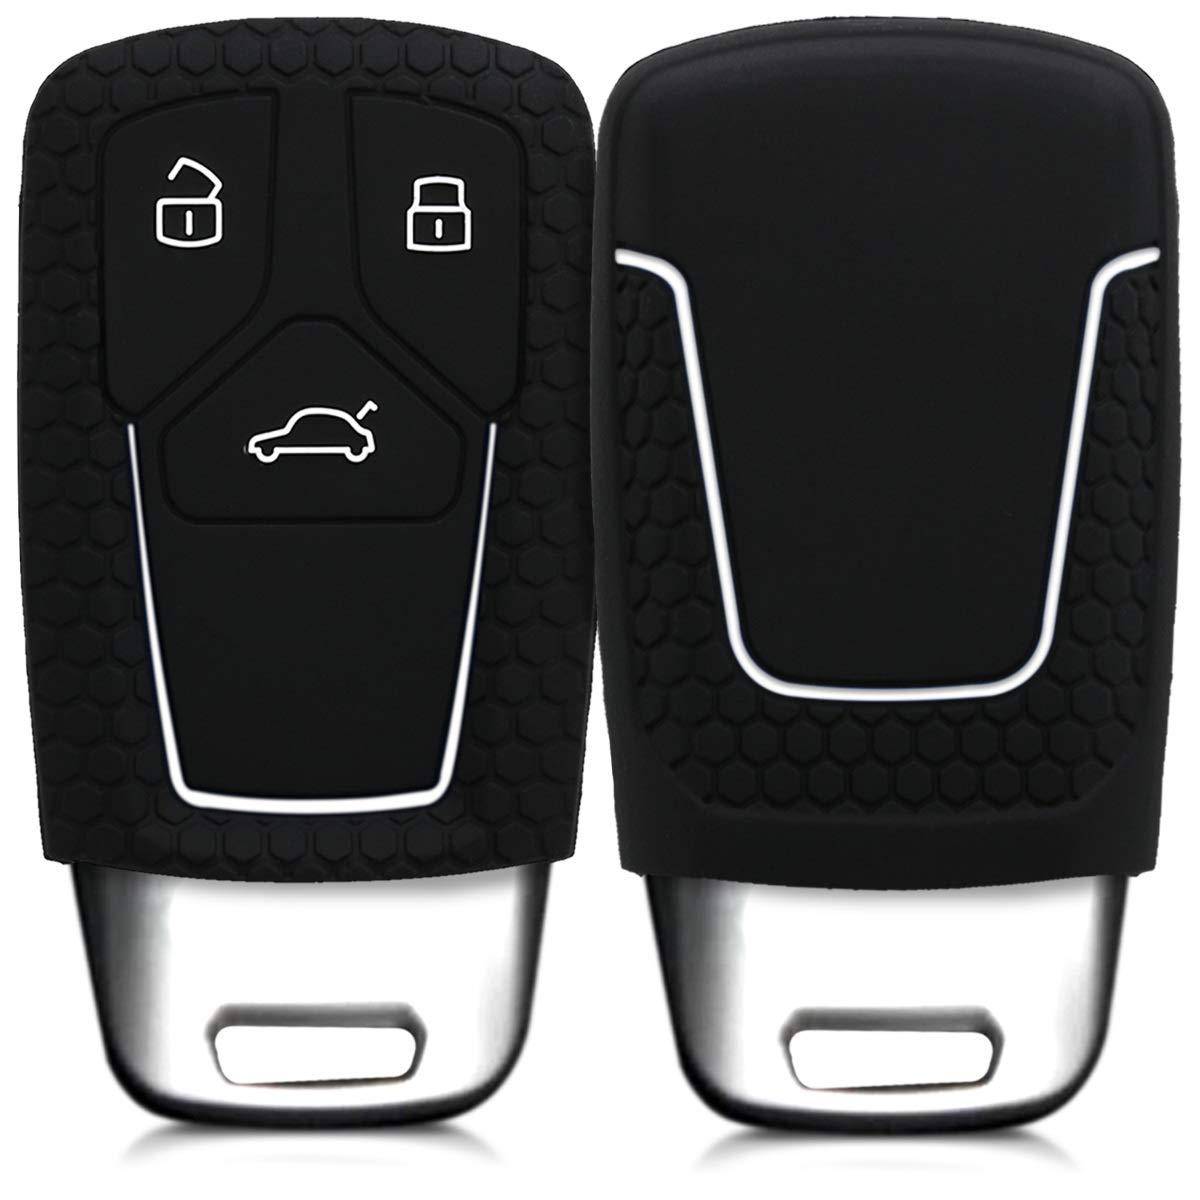 de Negro//Rojo Solamente Keyless Go Suave Silicona - Carcasa Protectora - Case Mando de Auto kwmobile Funda de Silicona para Llave Smartkey de 3 Botones para Coche Audi